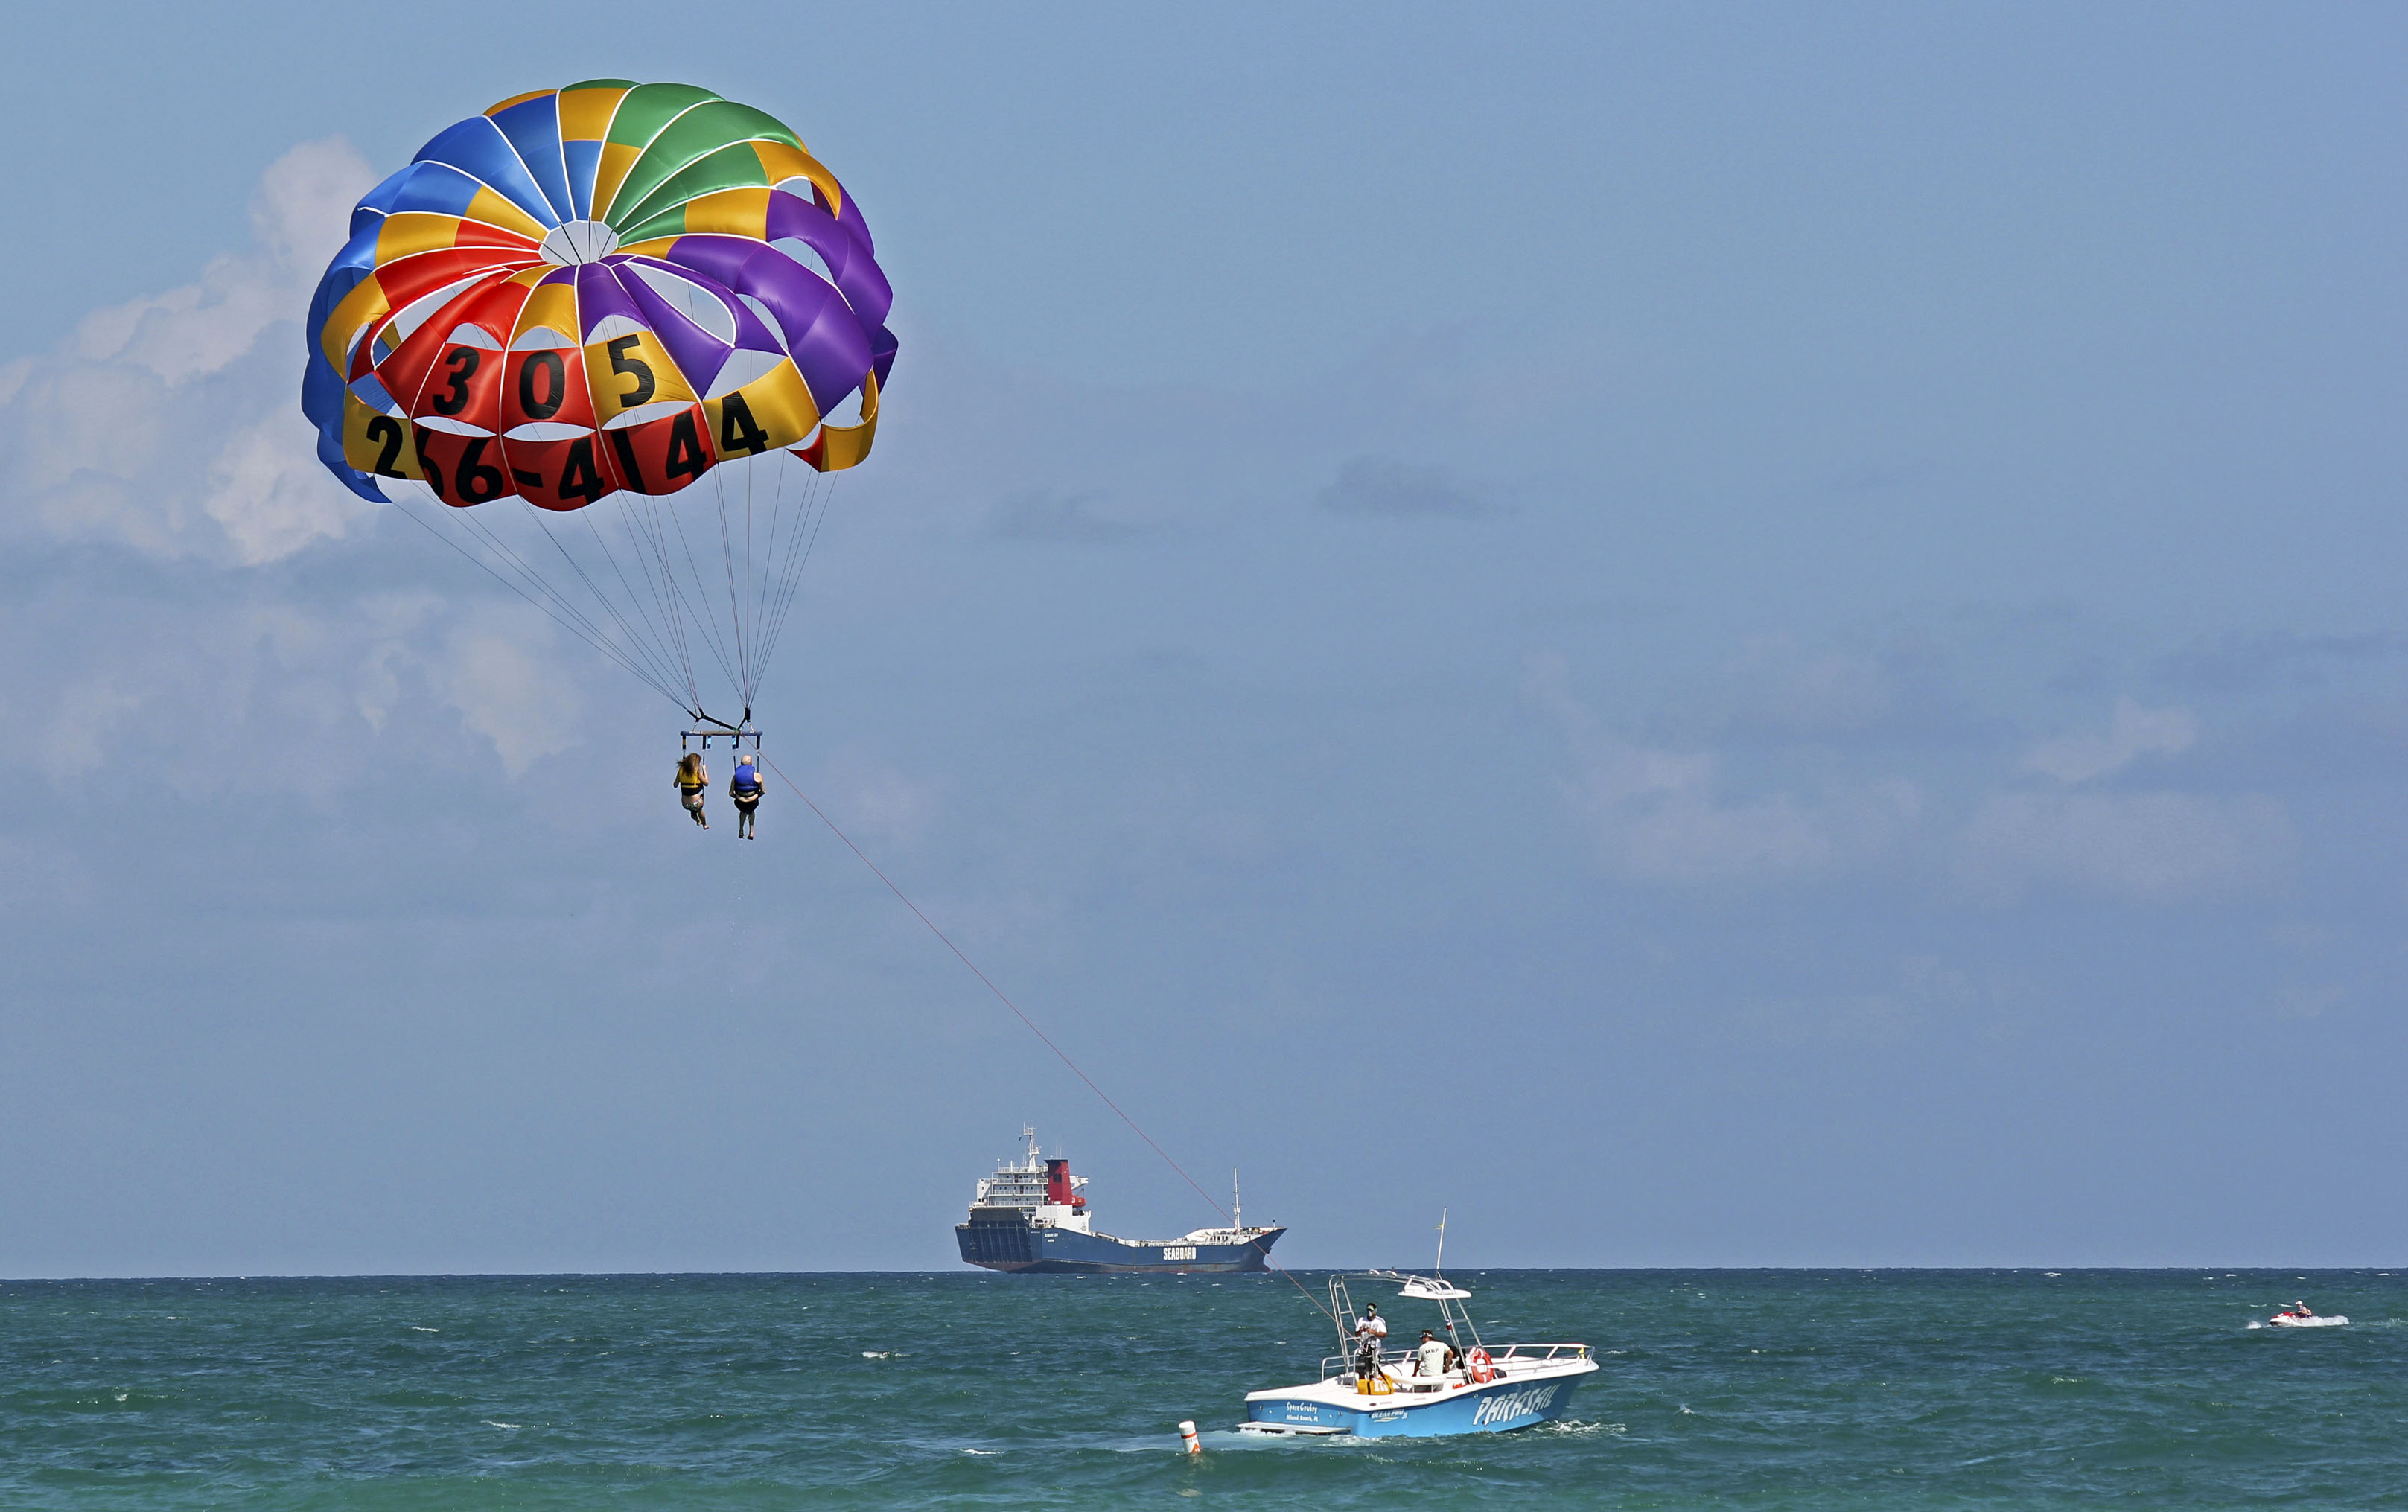 Paragliding Wallpaper Hd Washington Ntsb Says Parasailing Is Risky Urges Regulation